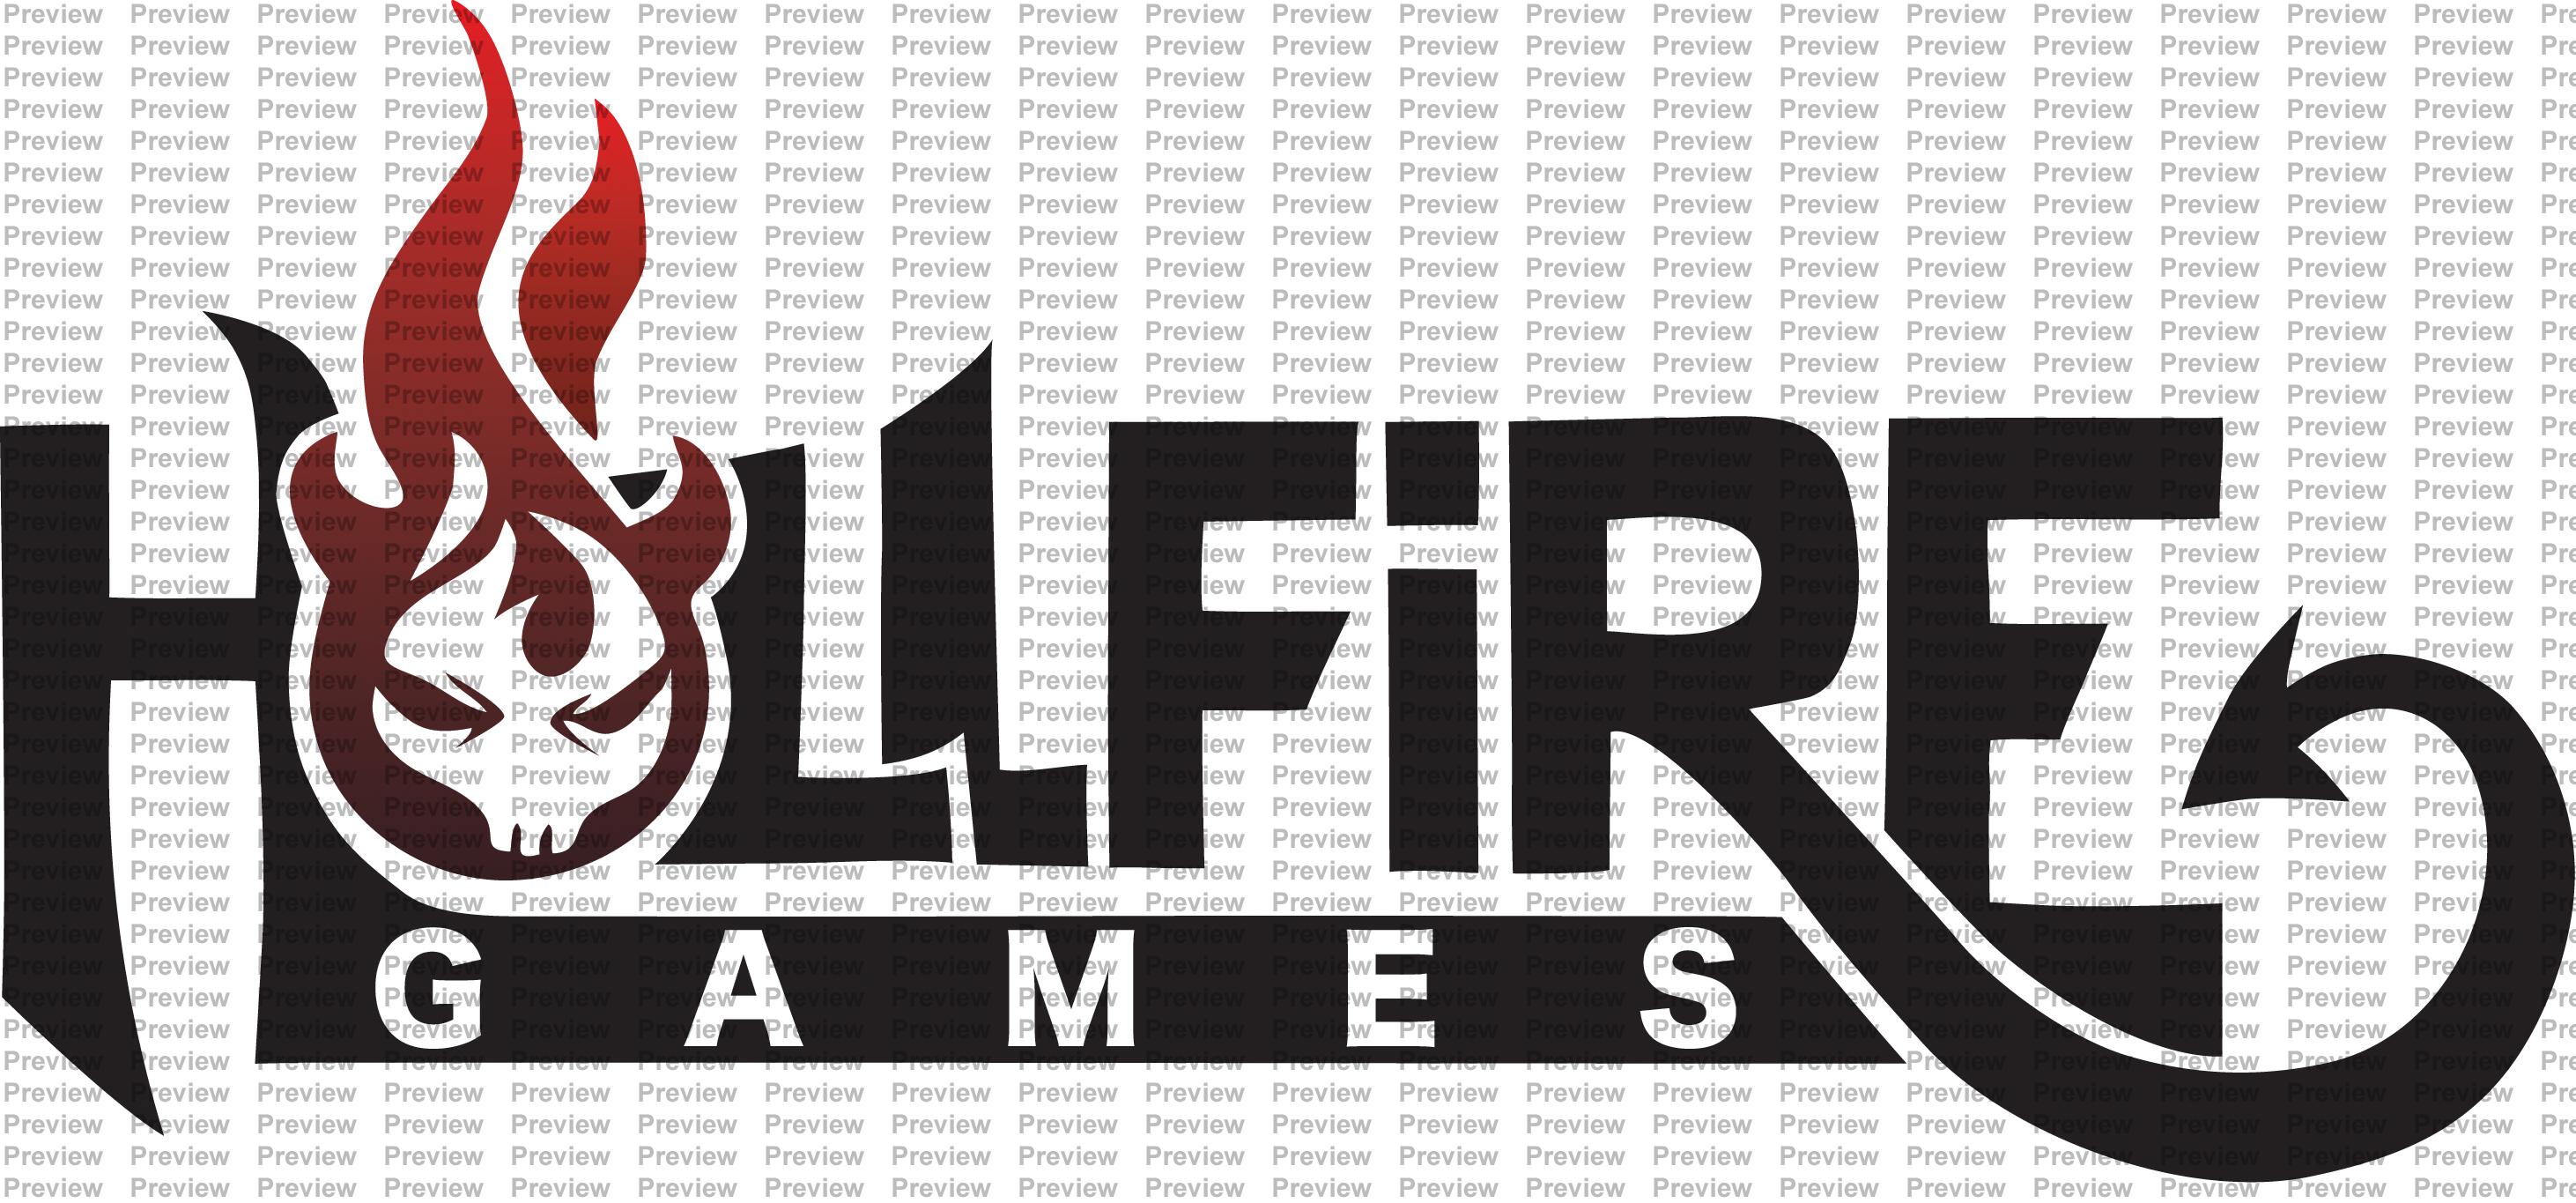 HellfireGames_FullLogo.png